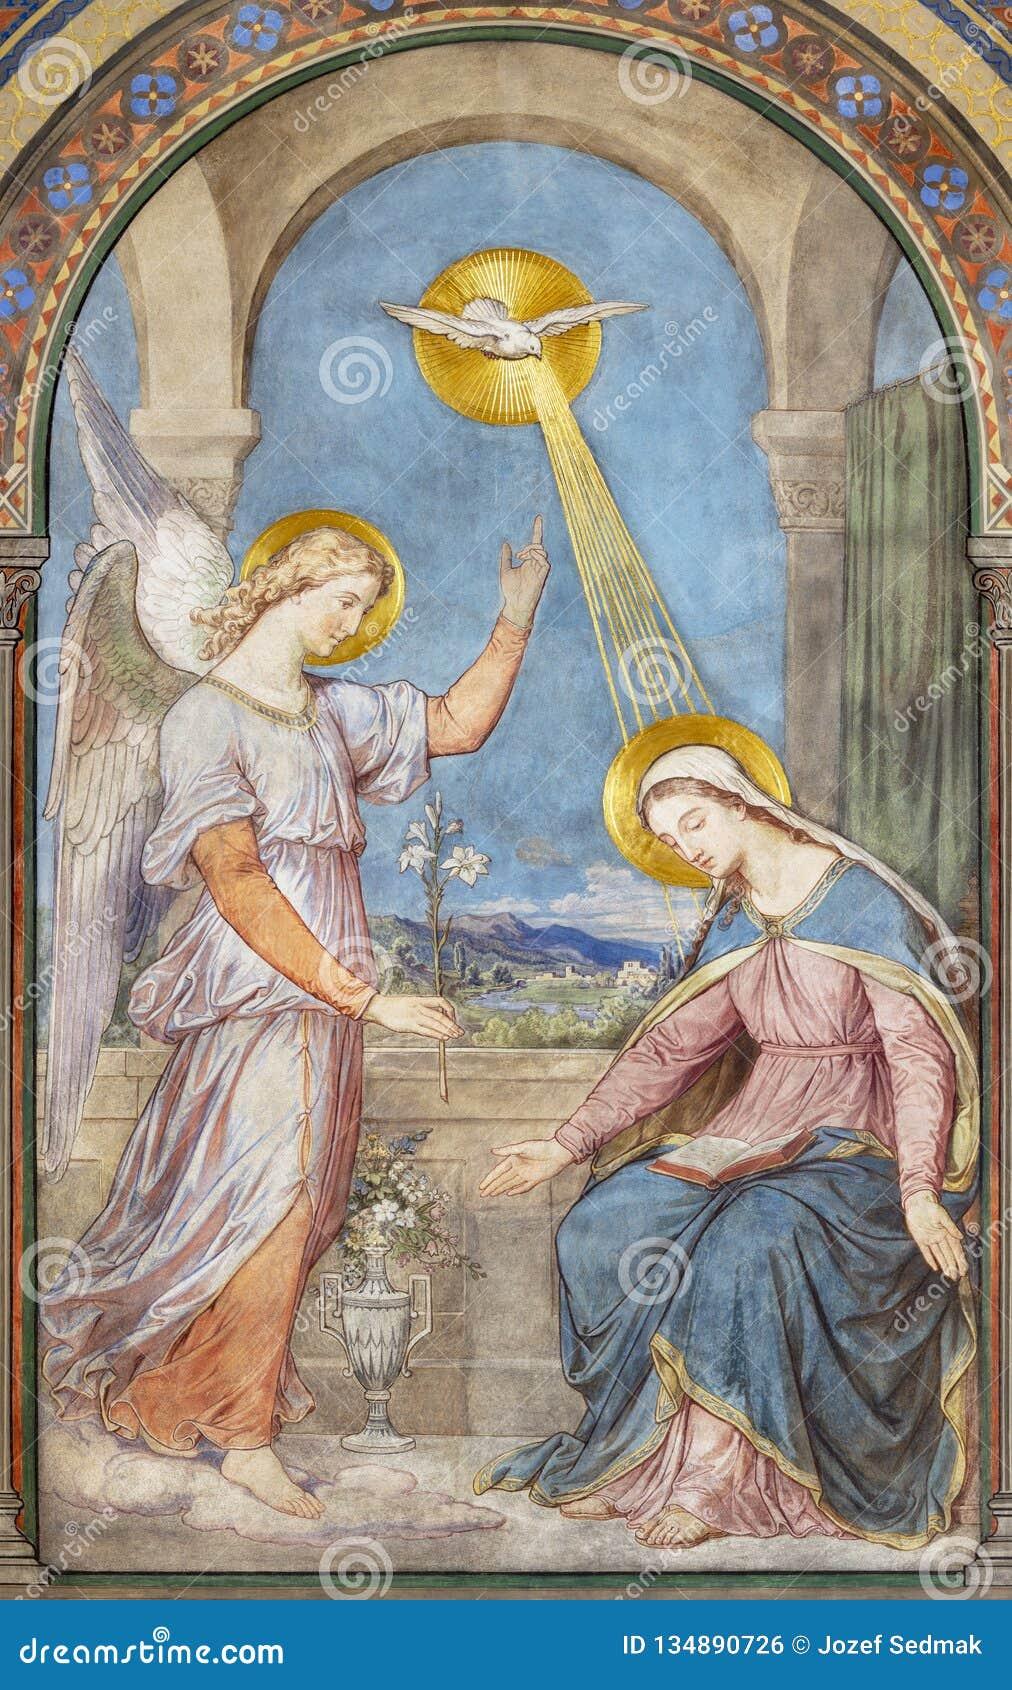 PRAGUE, CZECH REPUBLIC - 2018: The fresco of Annunciation in the church kostel Svatého Cyrila Metodeje by Petr Maixner